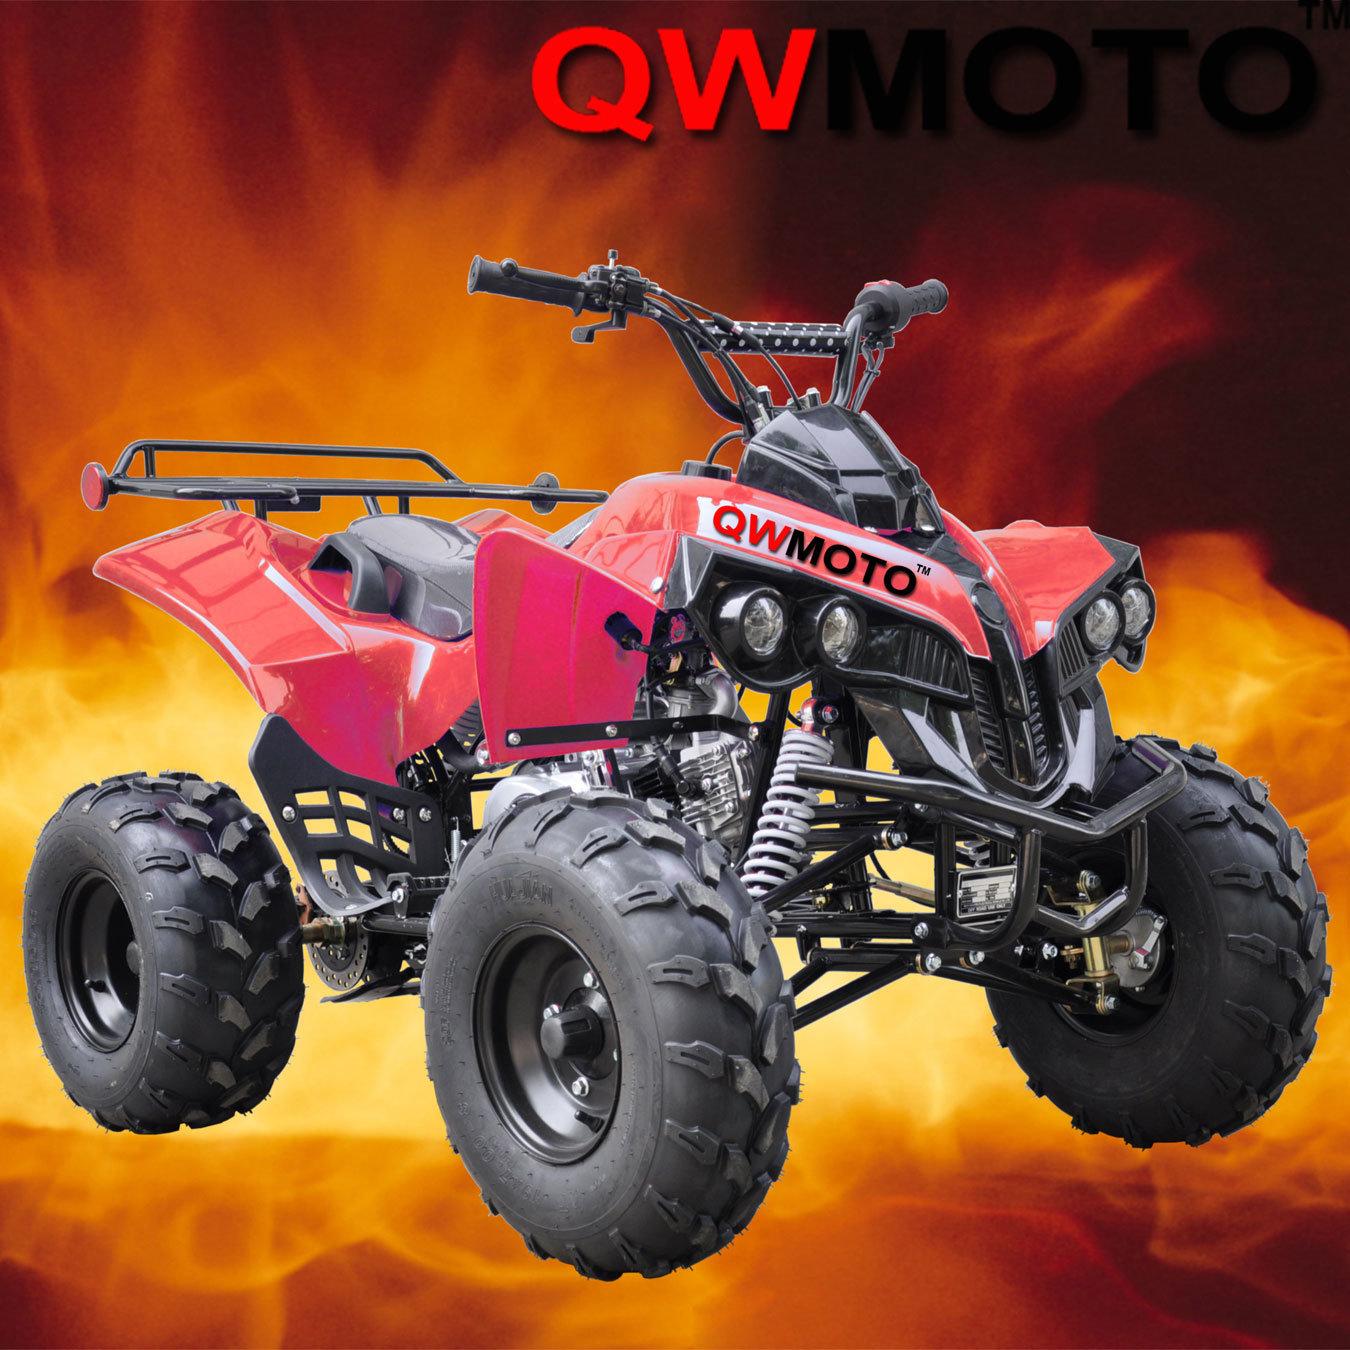 China 125CC ATV Quad Bike (QW-ATV-02E) - China 125cc Atv, Quad Bike